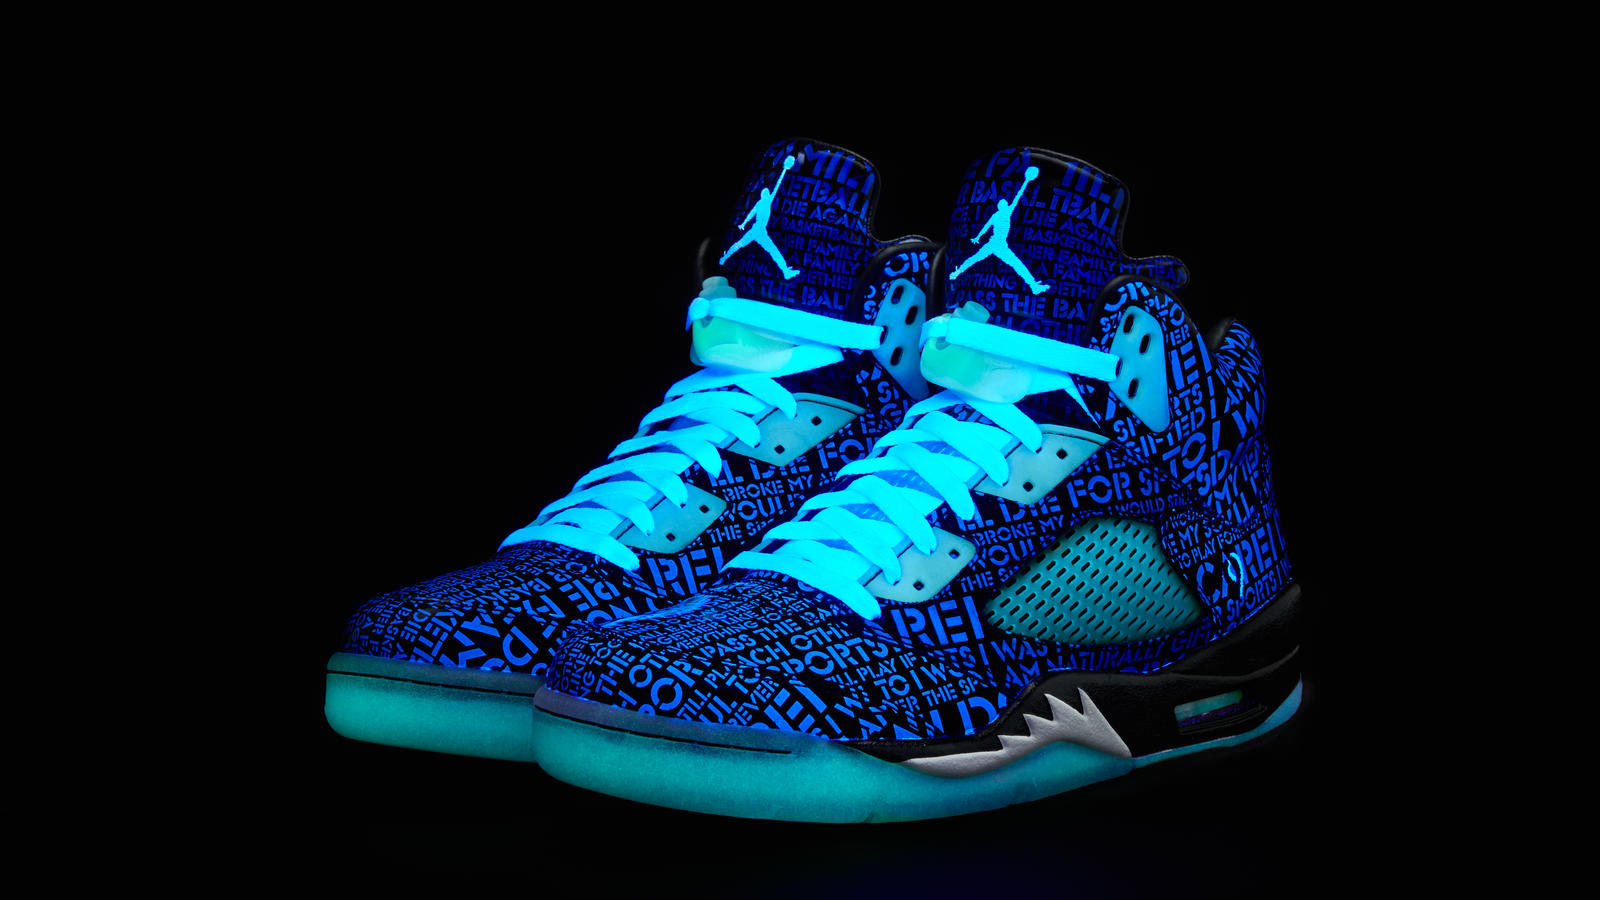 Nike Air Jordan Shoes All Models